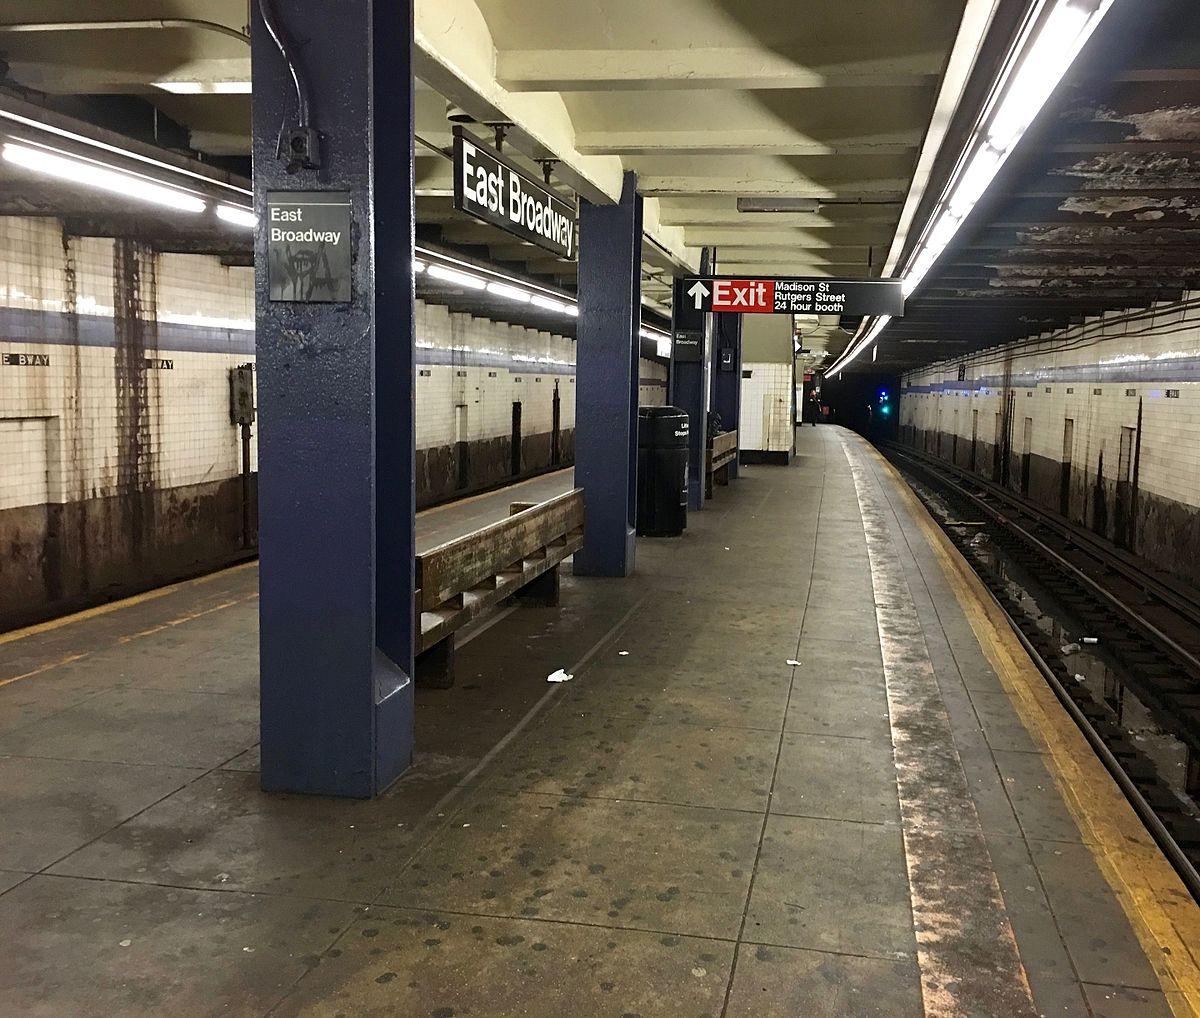 East Broadway Station